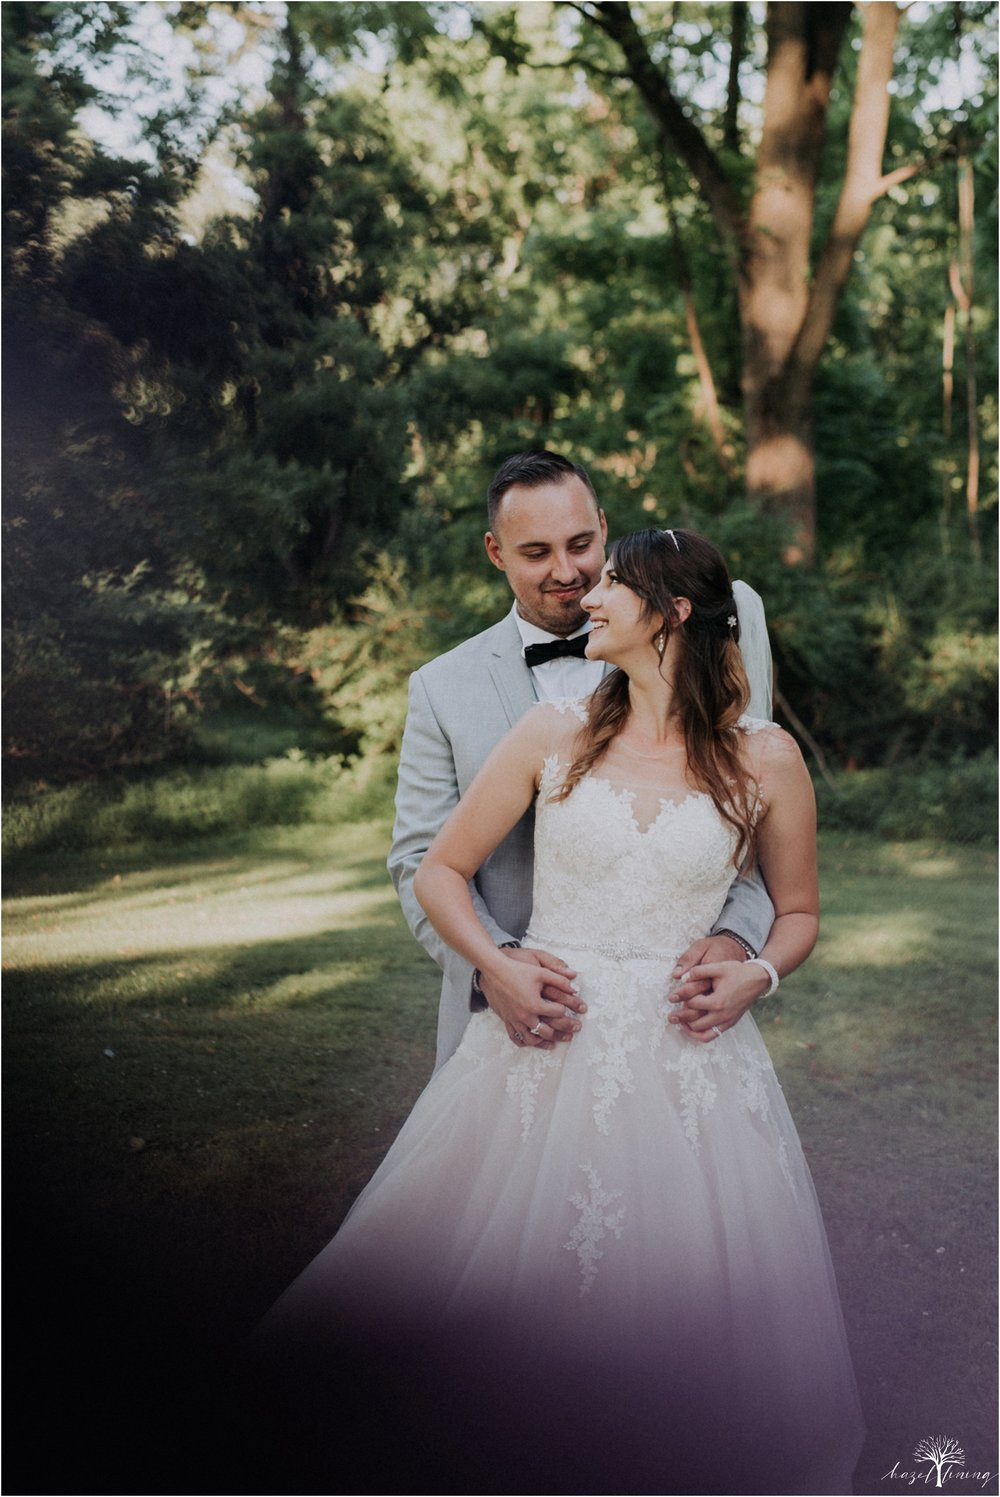 cassie-depinto-tyler-bodder-playwicki-farm-buck-hotel-featserville-trevose-pennsylvania-summer-outdoor-wedding-hazel-lining-travel-wedding-elopement-photography_0256.jpg